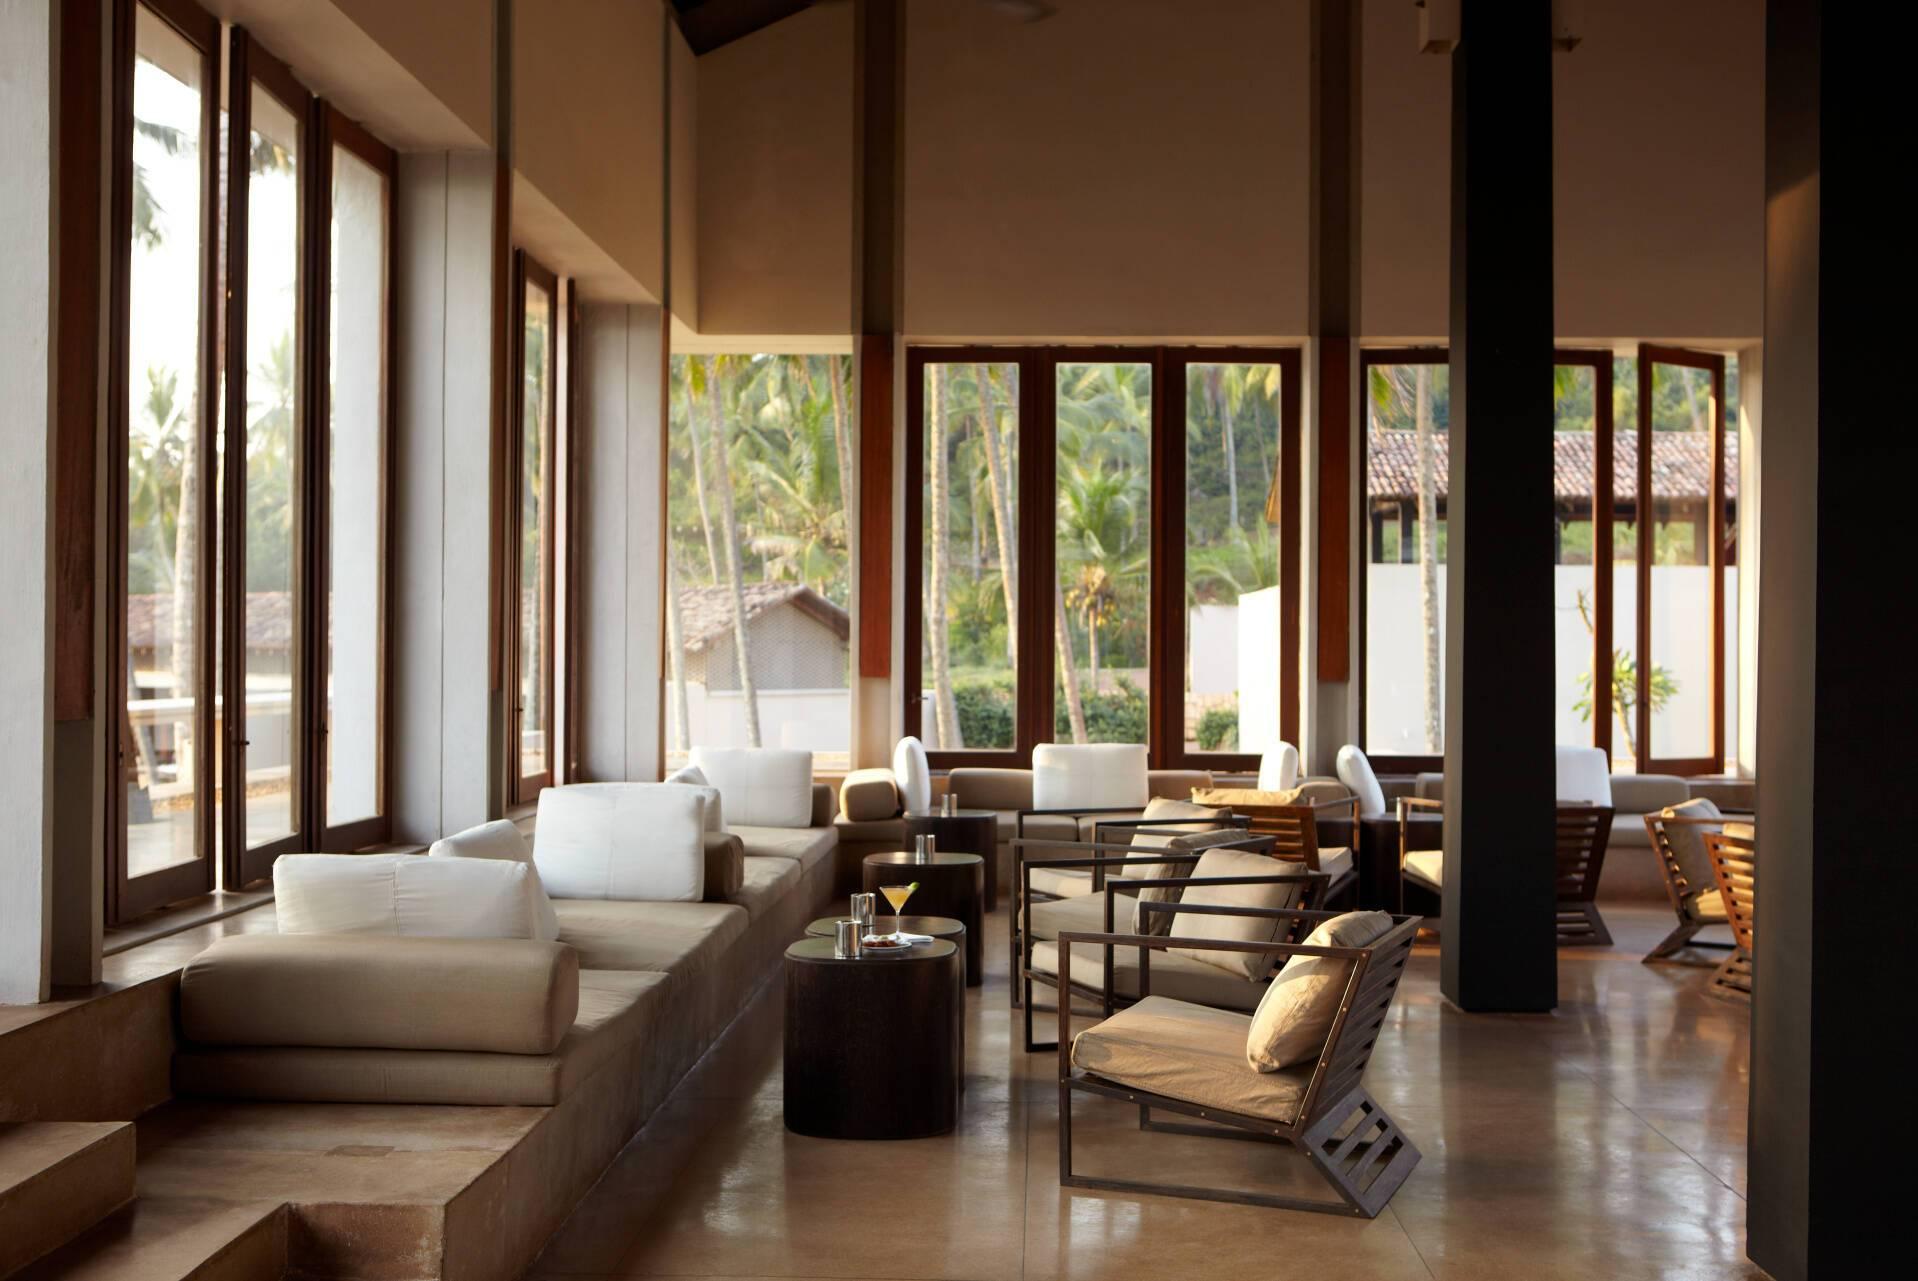 Amanwella Sri Lanka Lounge Bar